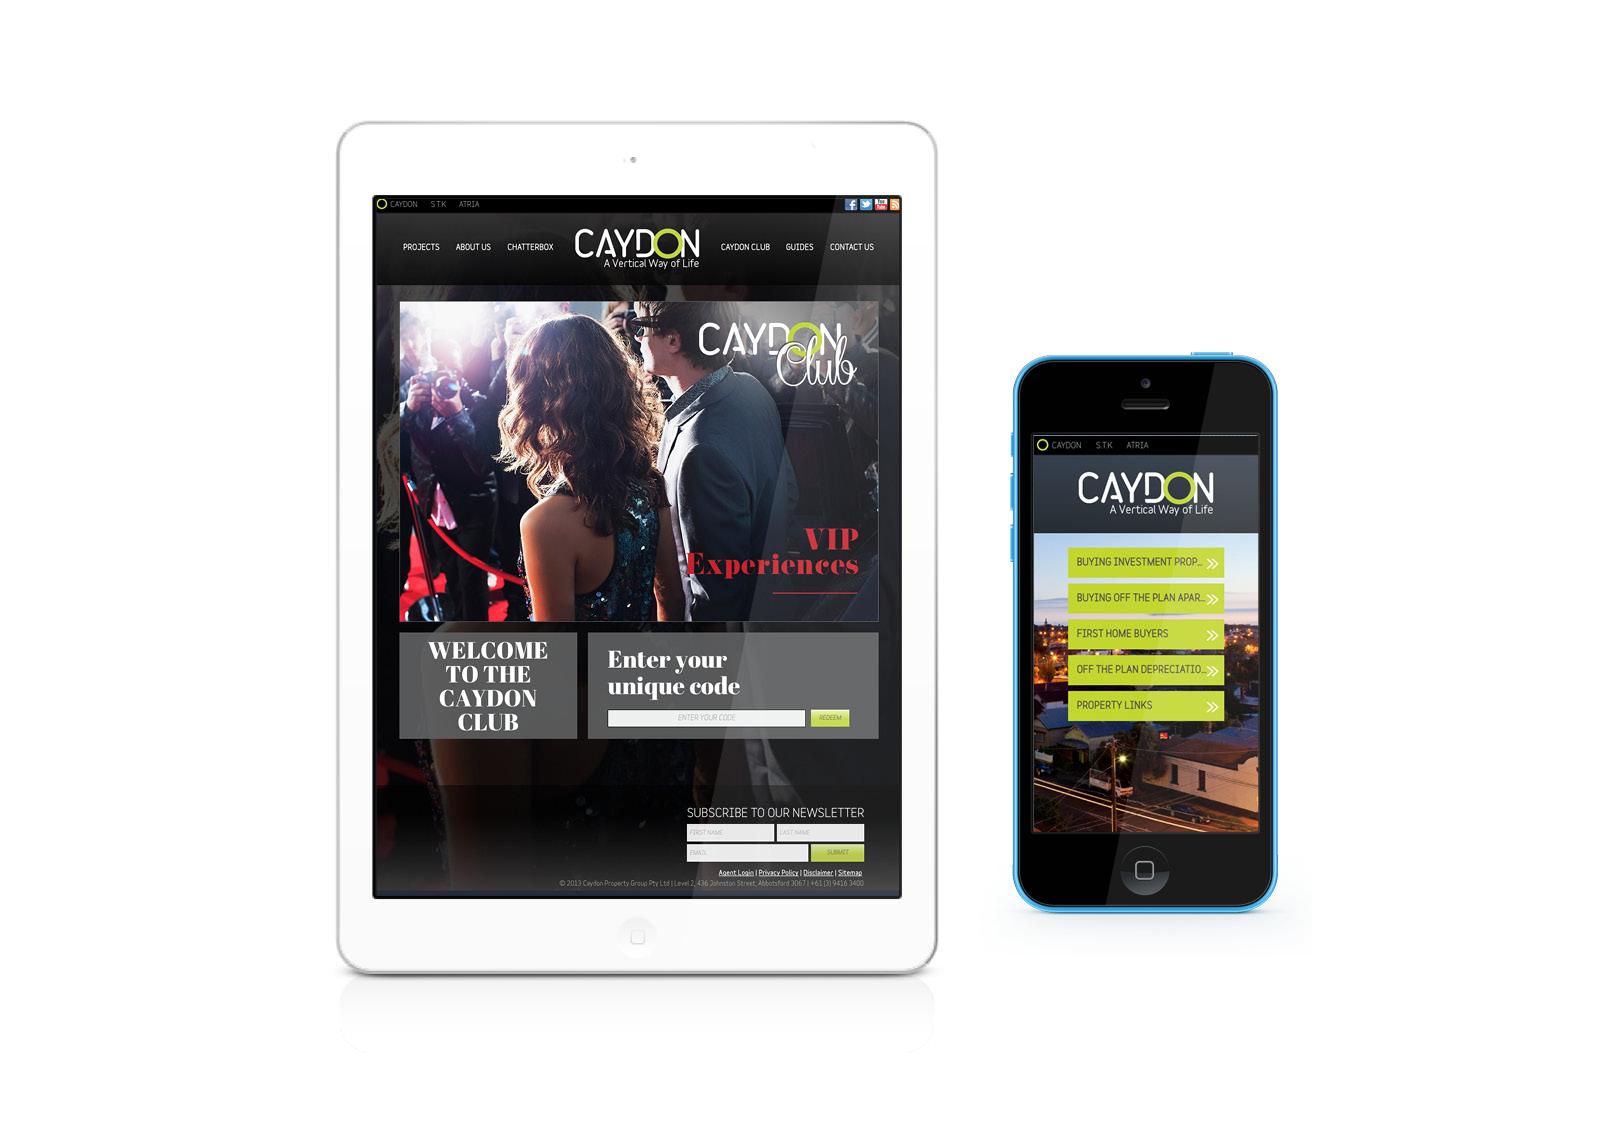 Caydon mobile site - club